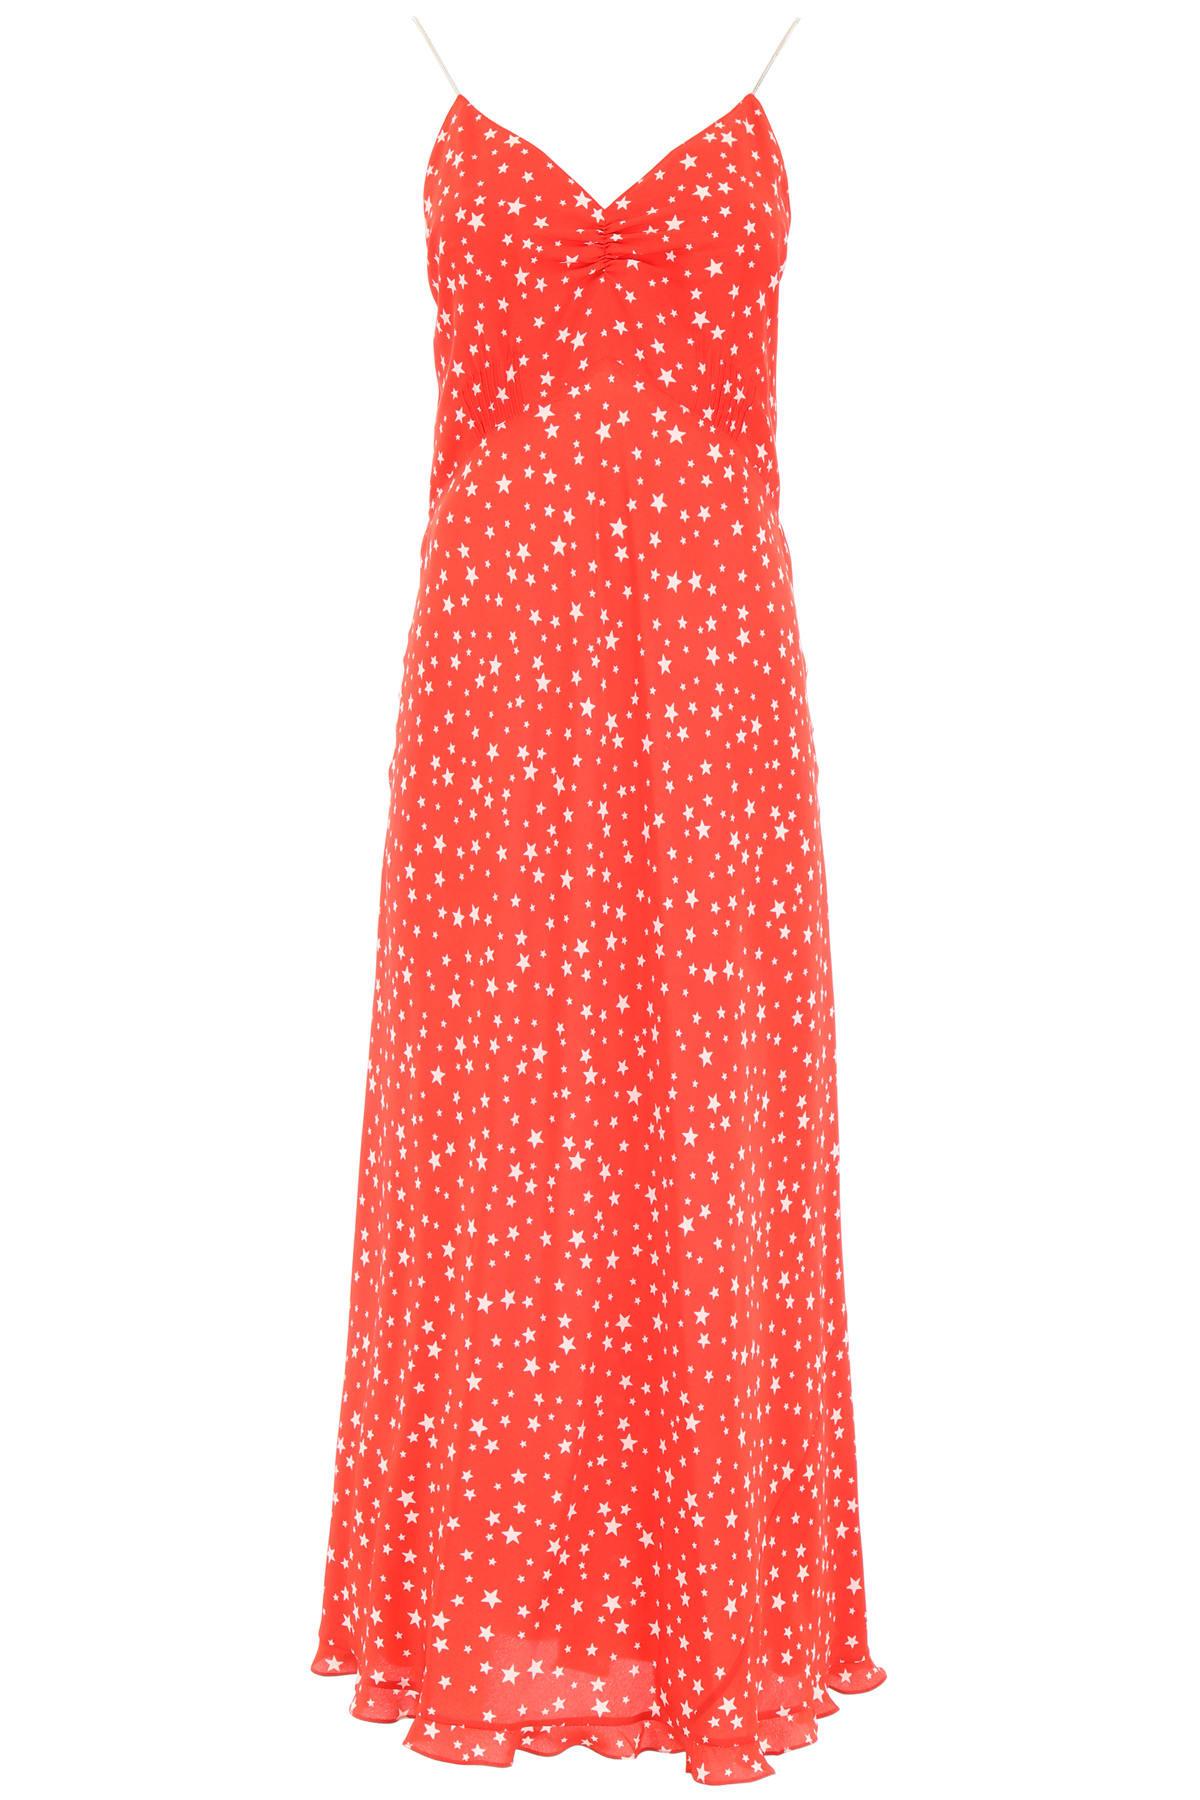 Miu Miu Long Dress With Stars